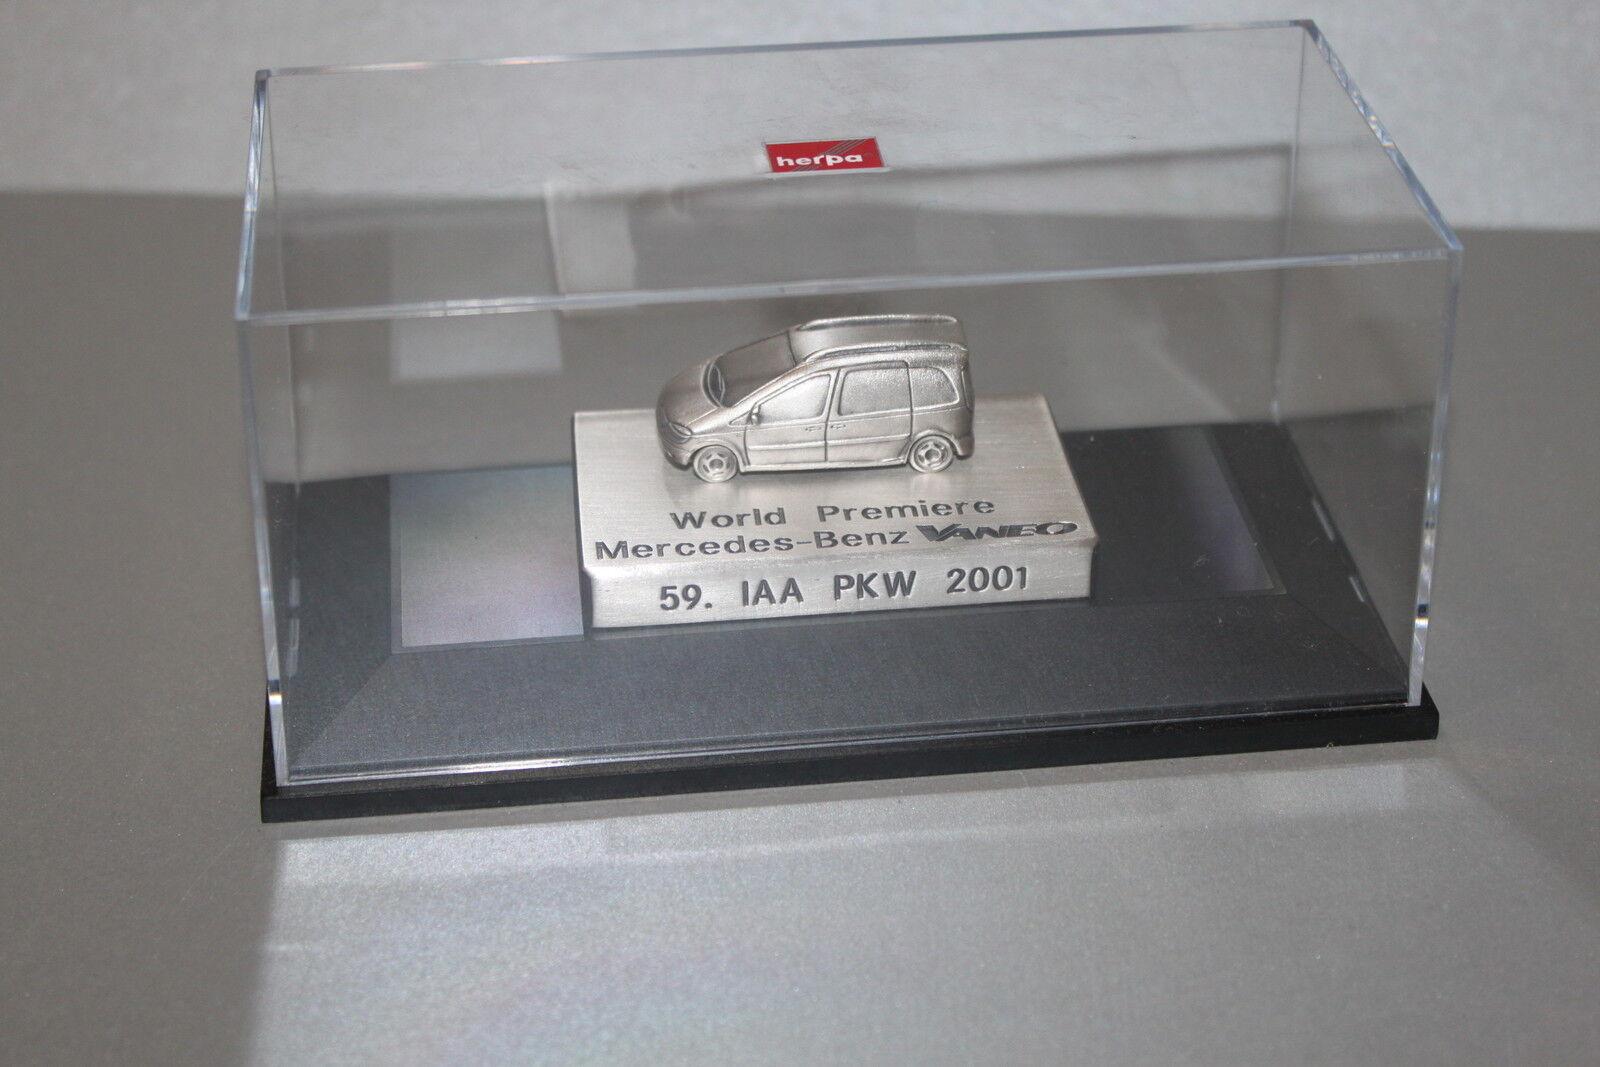 Herpa 1 87 World Premiere Mercedes-Benz Vaneo 59.IAA PKW 2001 2001 2001 in Vitrine 648906